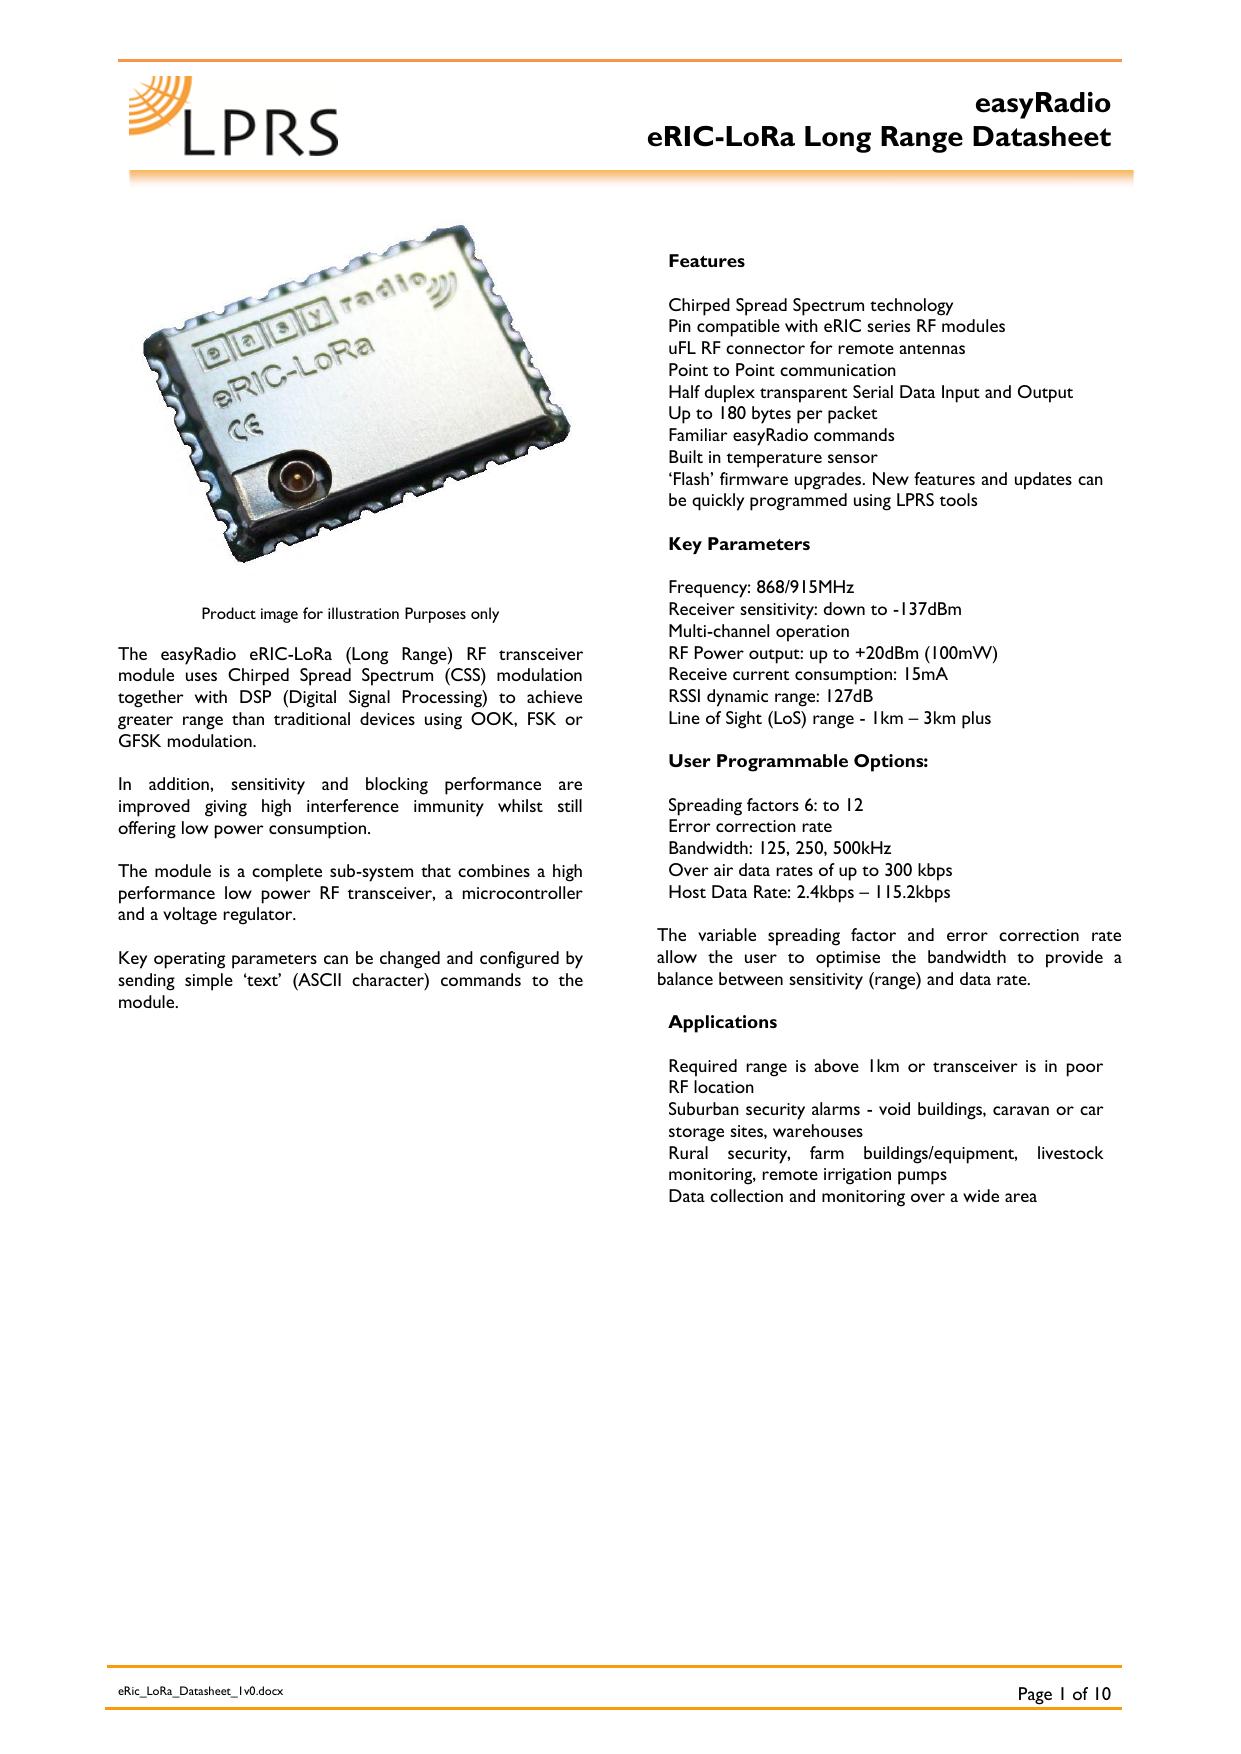 easyRadio eRIC-LoRa Long Range Datasheet | manualzz com